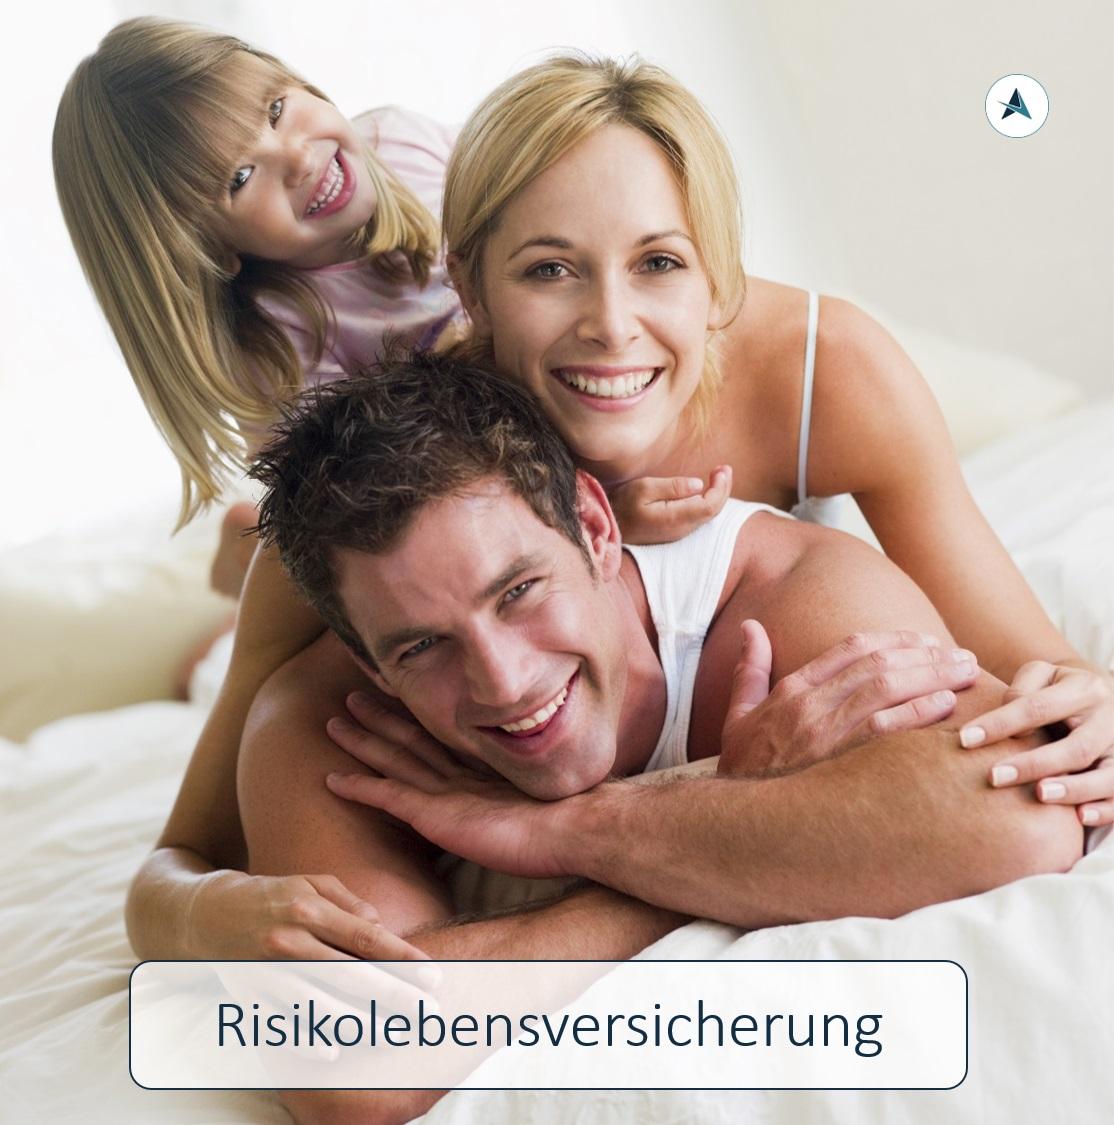 Versicherungsmakler-Berlin-Kaulsdorf-Risikolebensversicherung-Lebensversicherung-André-Böttcher-Risiko-Leben